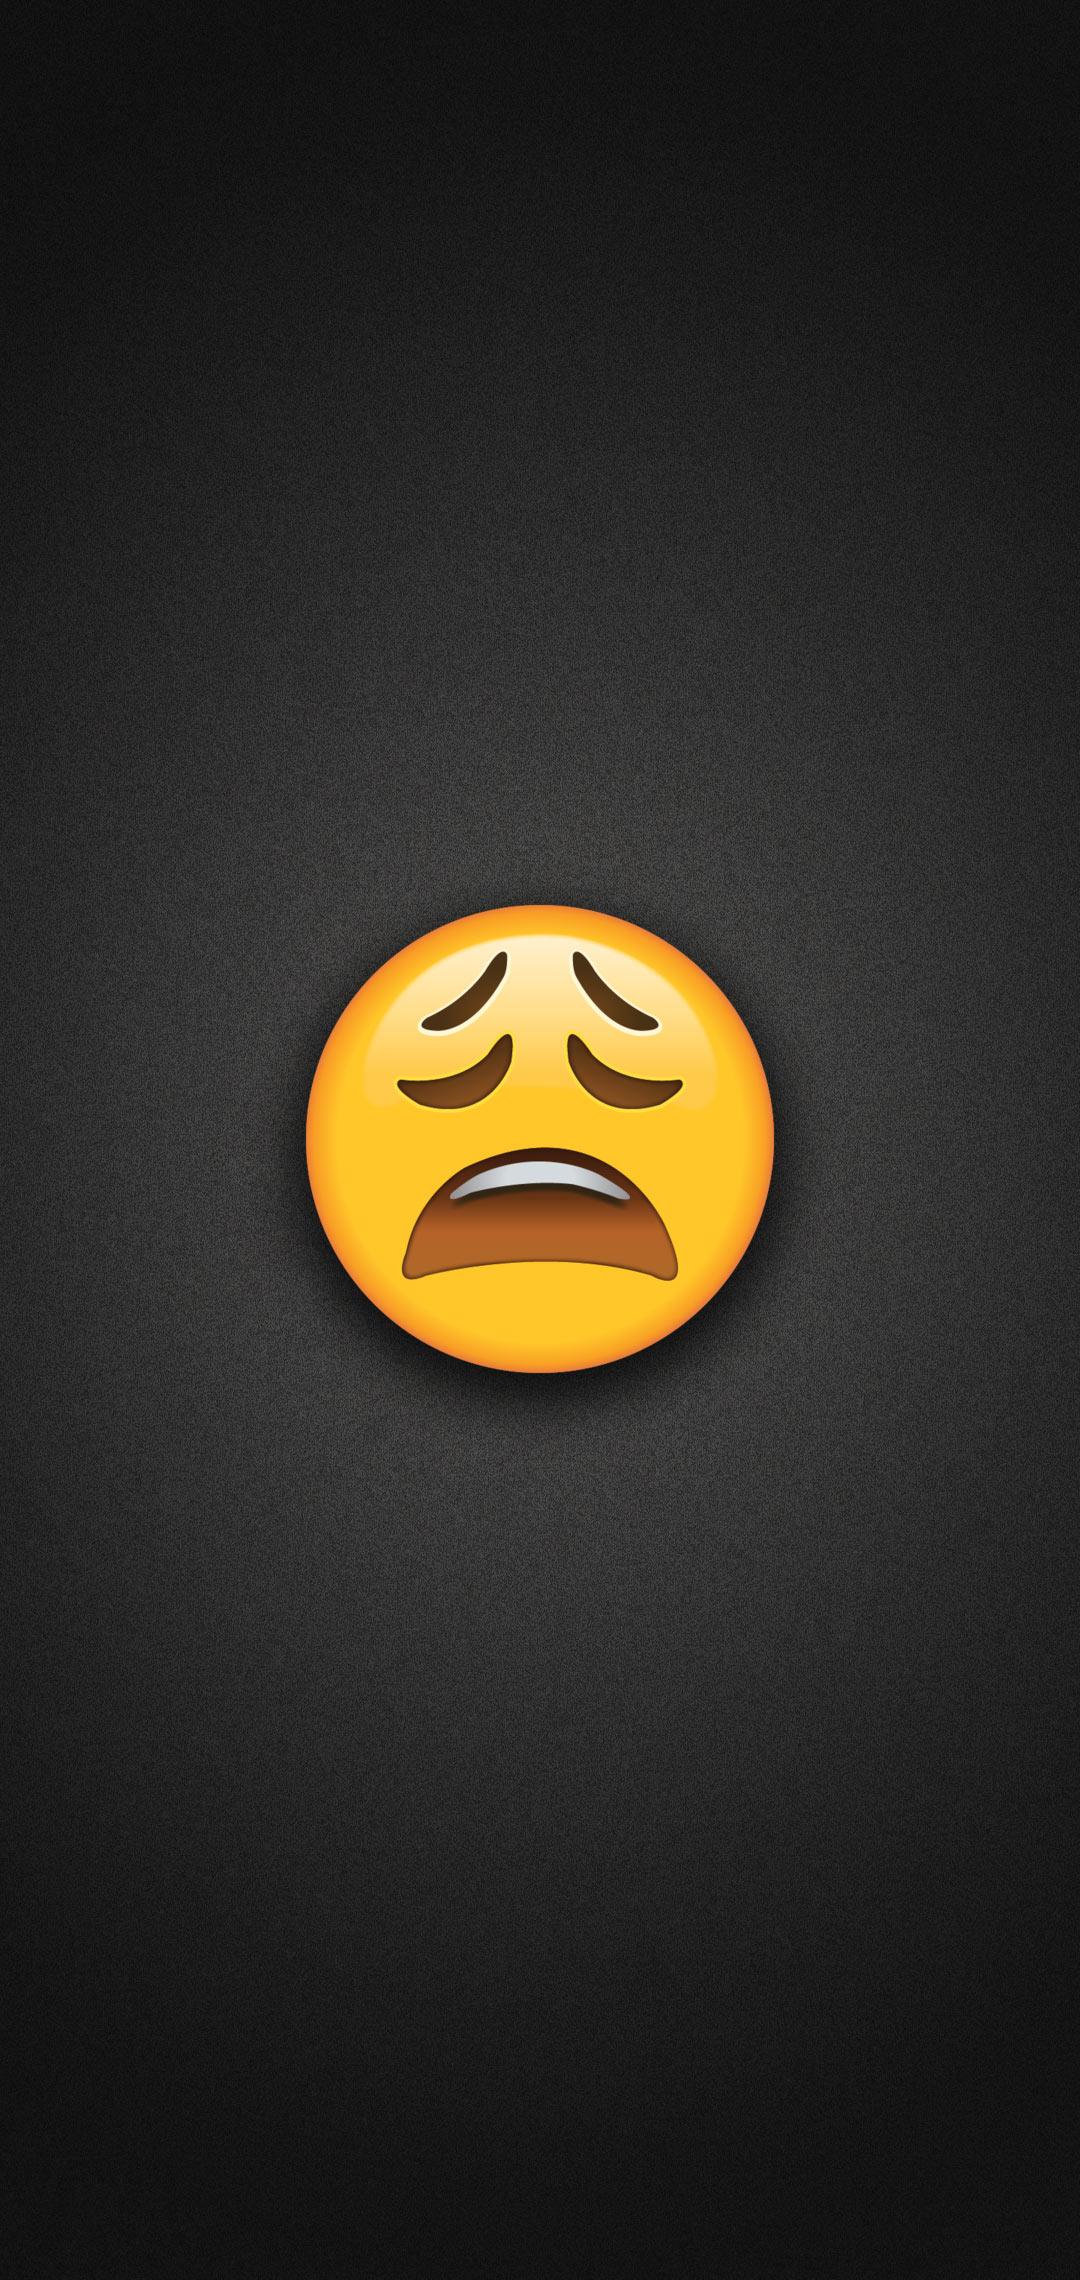 Tired Face Emoji Phone Wallpaper